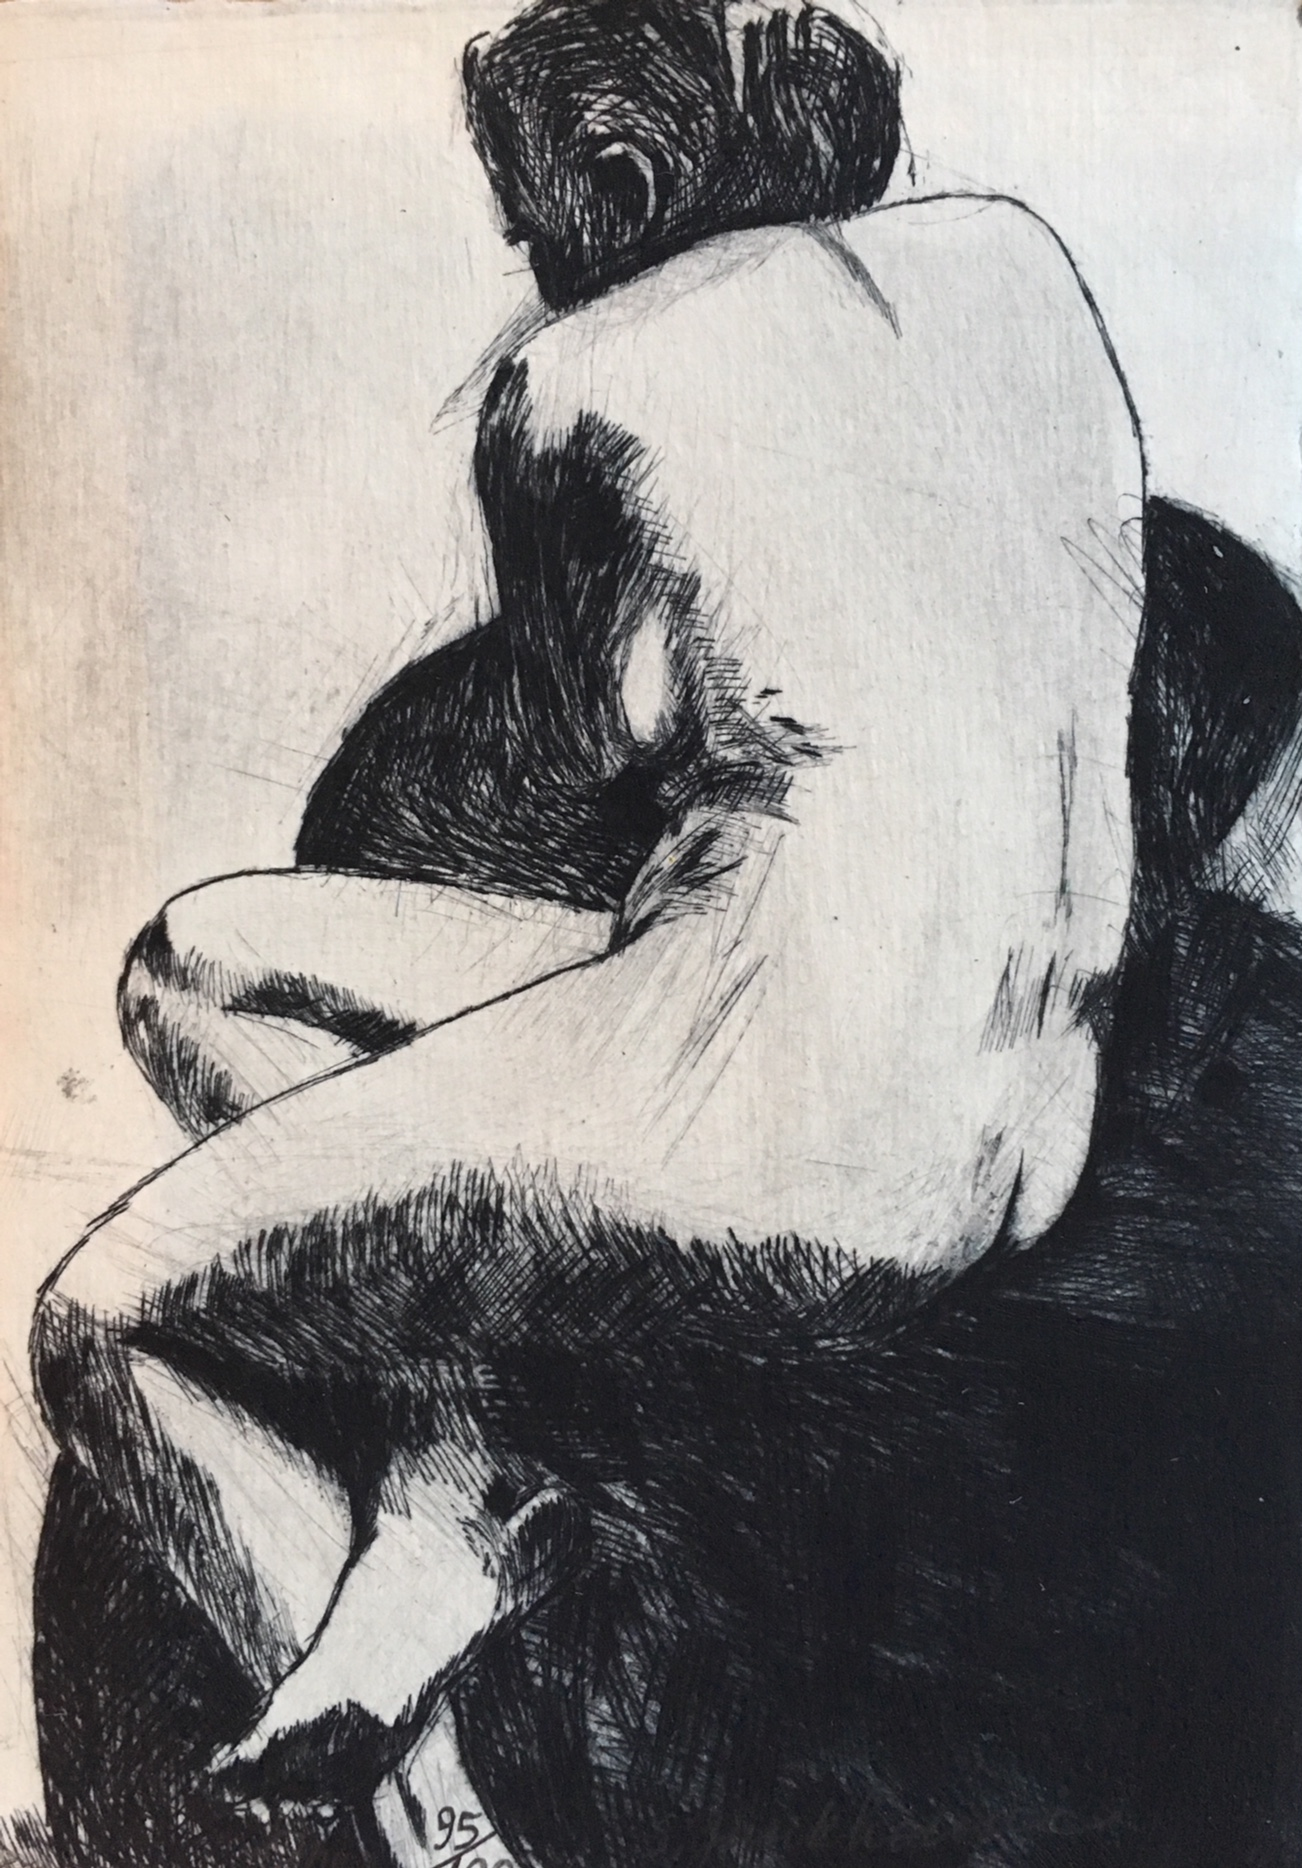 Sheryl Funkhouser, One, drypoint